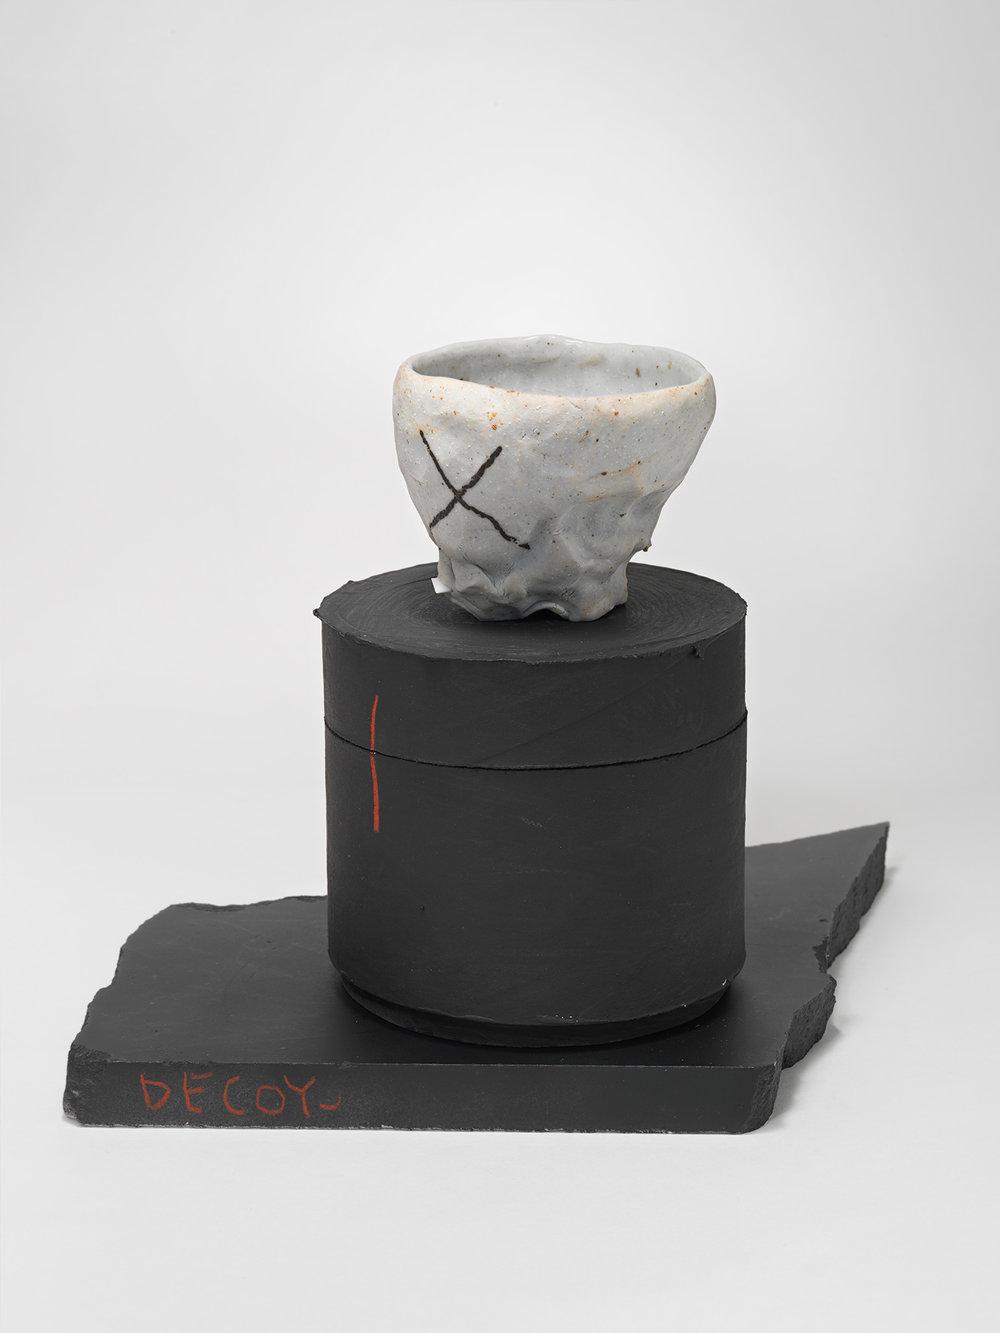 "DECOY_Cup_6 . Porcelain, cardboard, granite. 8.5"" x 9"" x 8.5"". 2014."